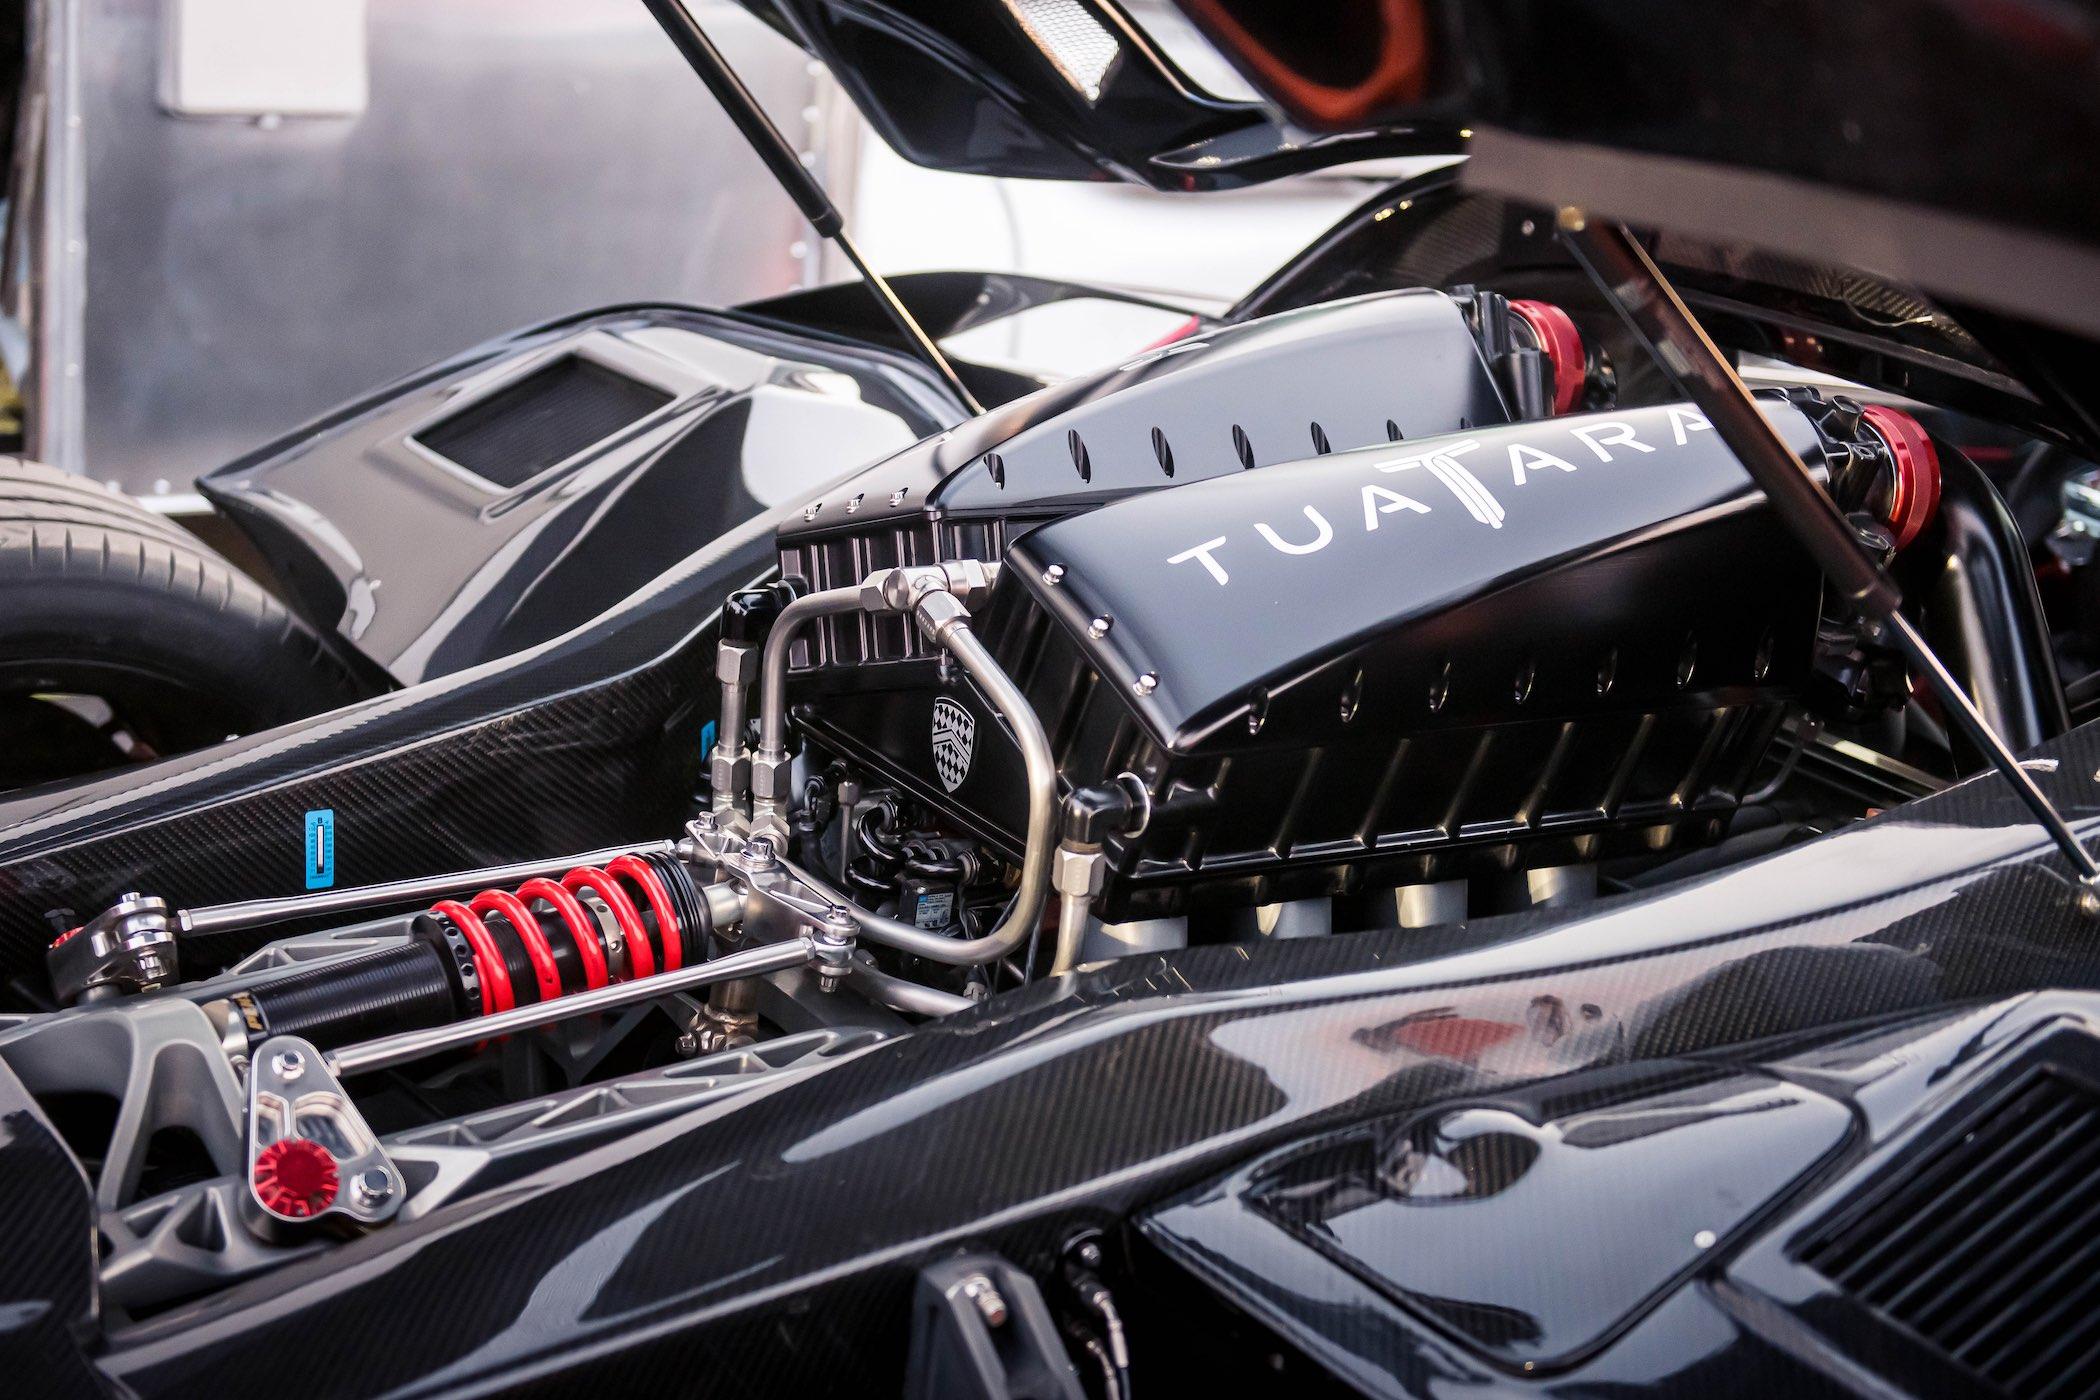 SSC Tuatara - 2020 Fastest Road Car in The World - 6